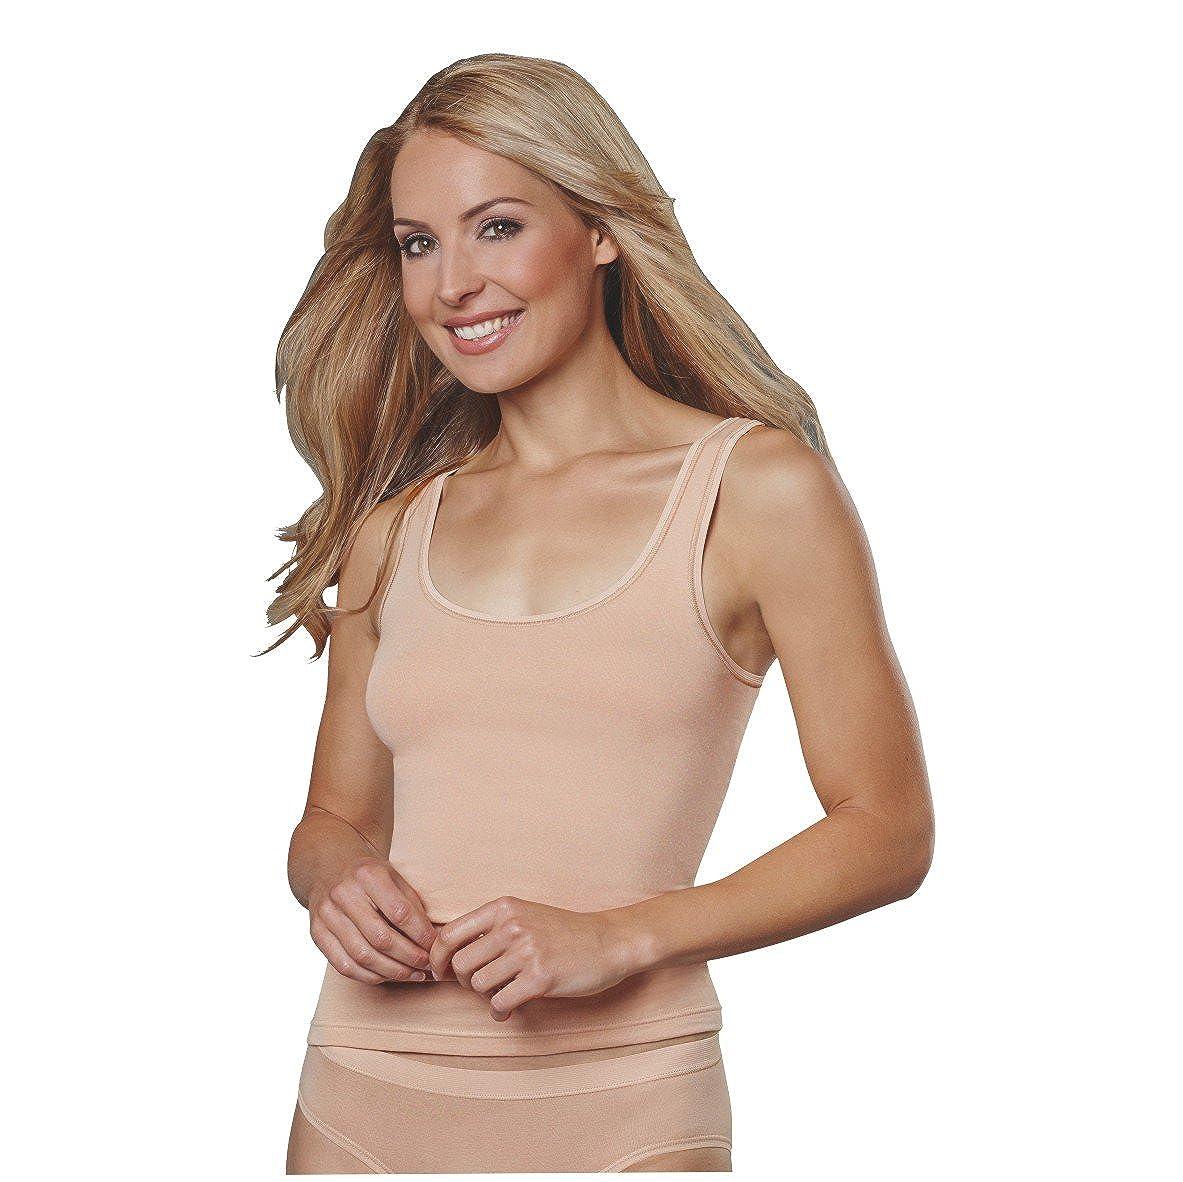 Conta Damen Achselhemd Comfort Comfort Comfort 3er Pack B015NI3T6U Unterhemden & BH-Hemden Flagship-Store dedb16